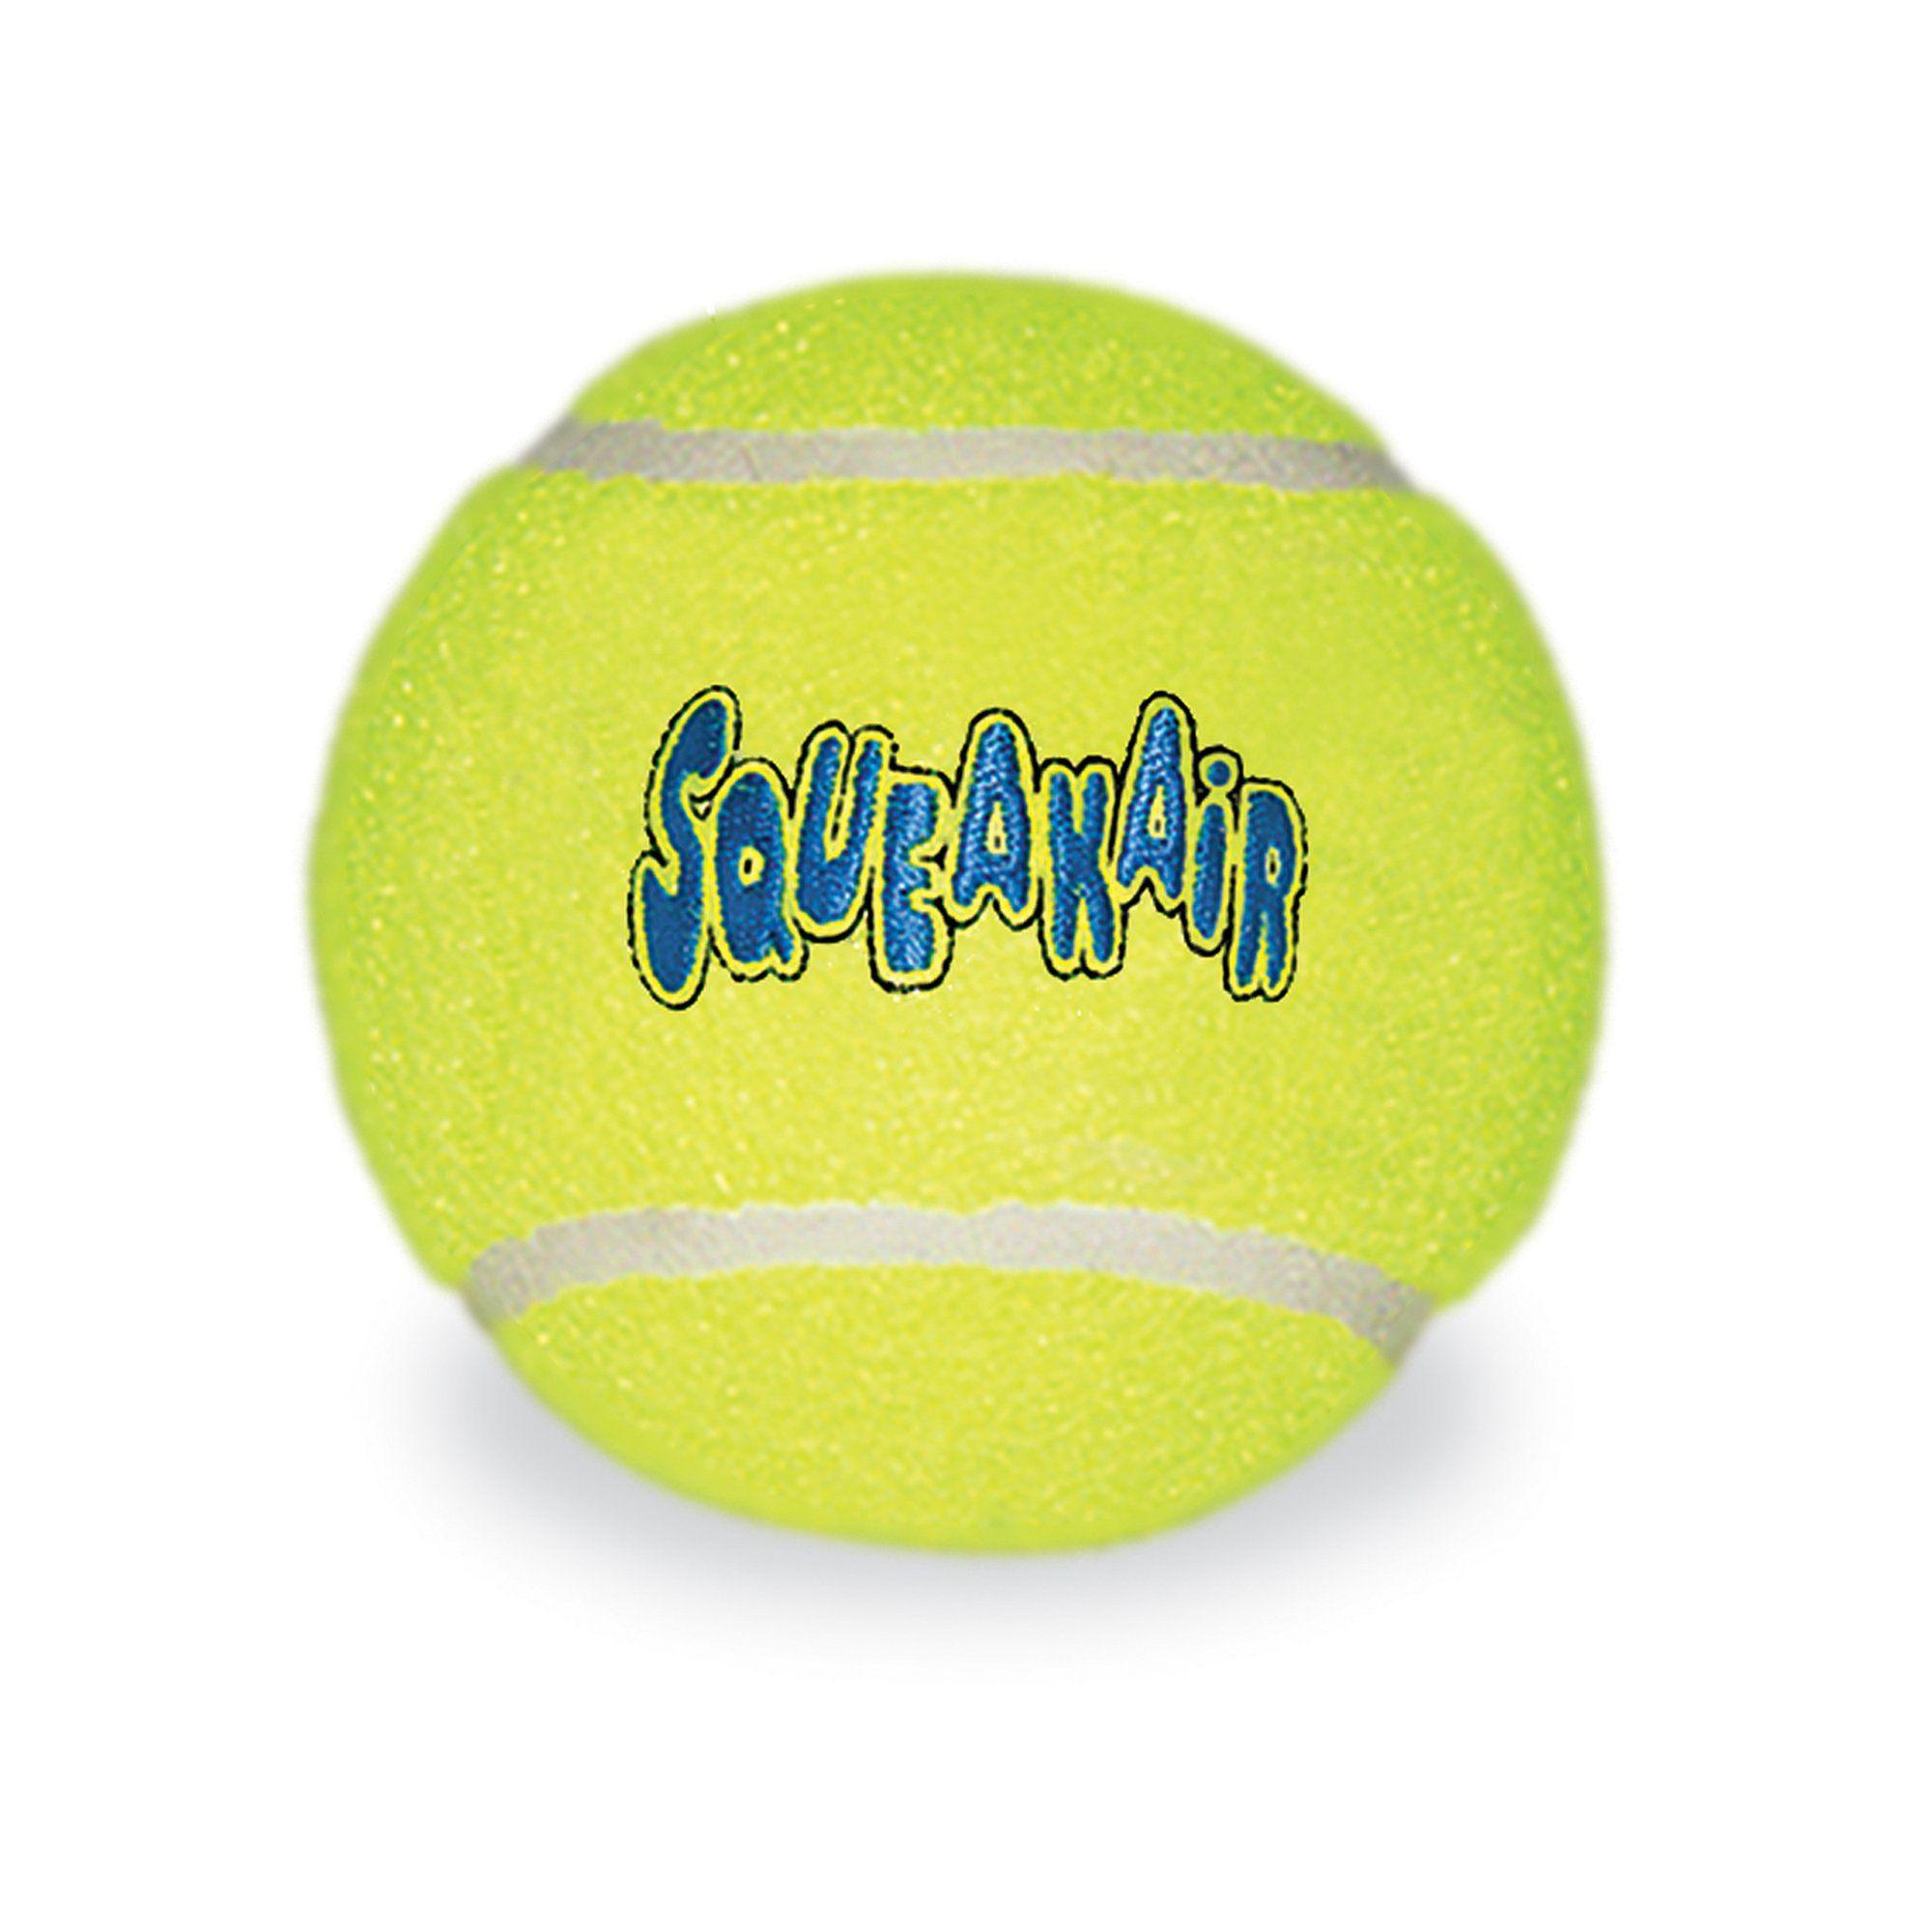 Kong Squeakair Tennis Ball X Large Dog Fetch Toy Dog Toys Kong Dog Toys